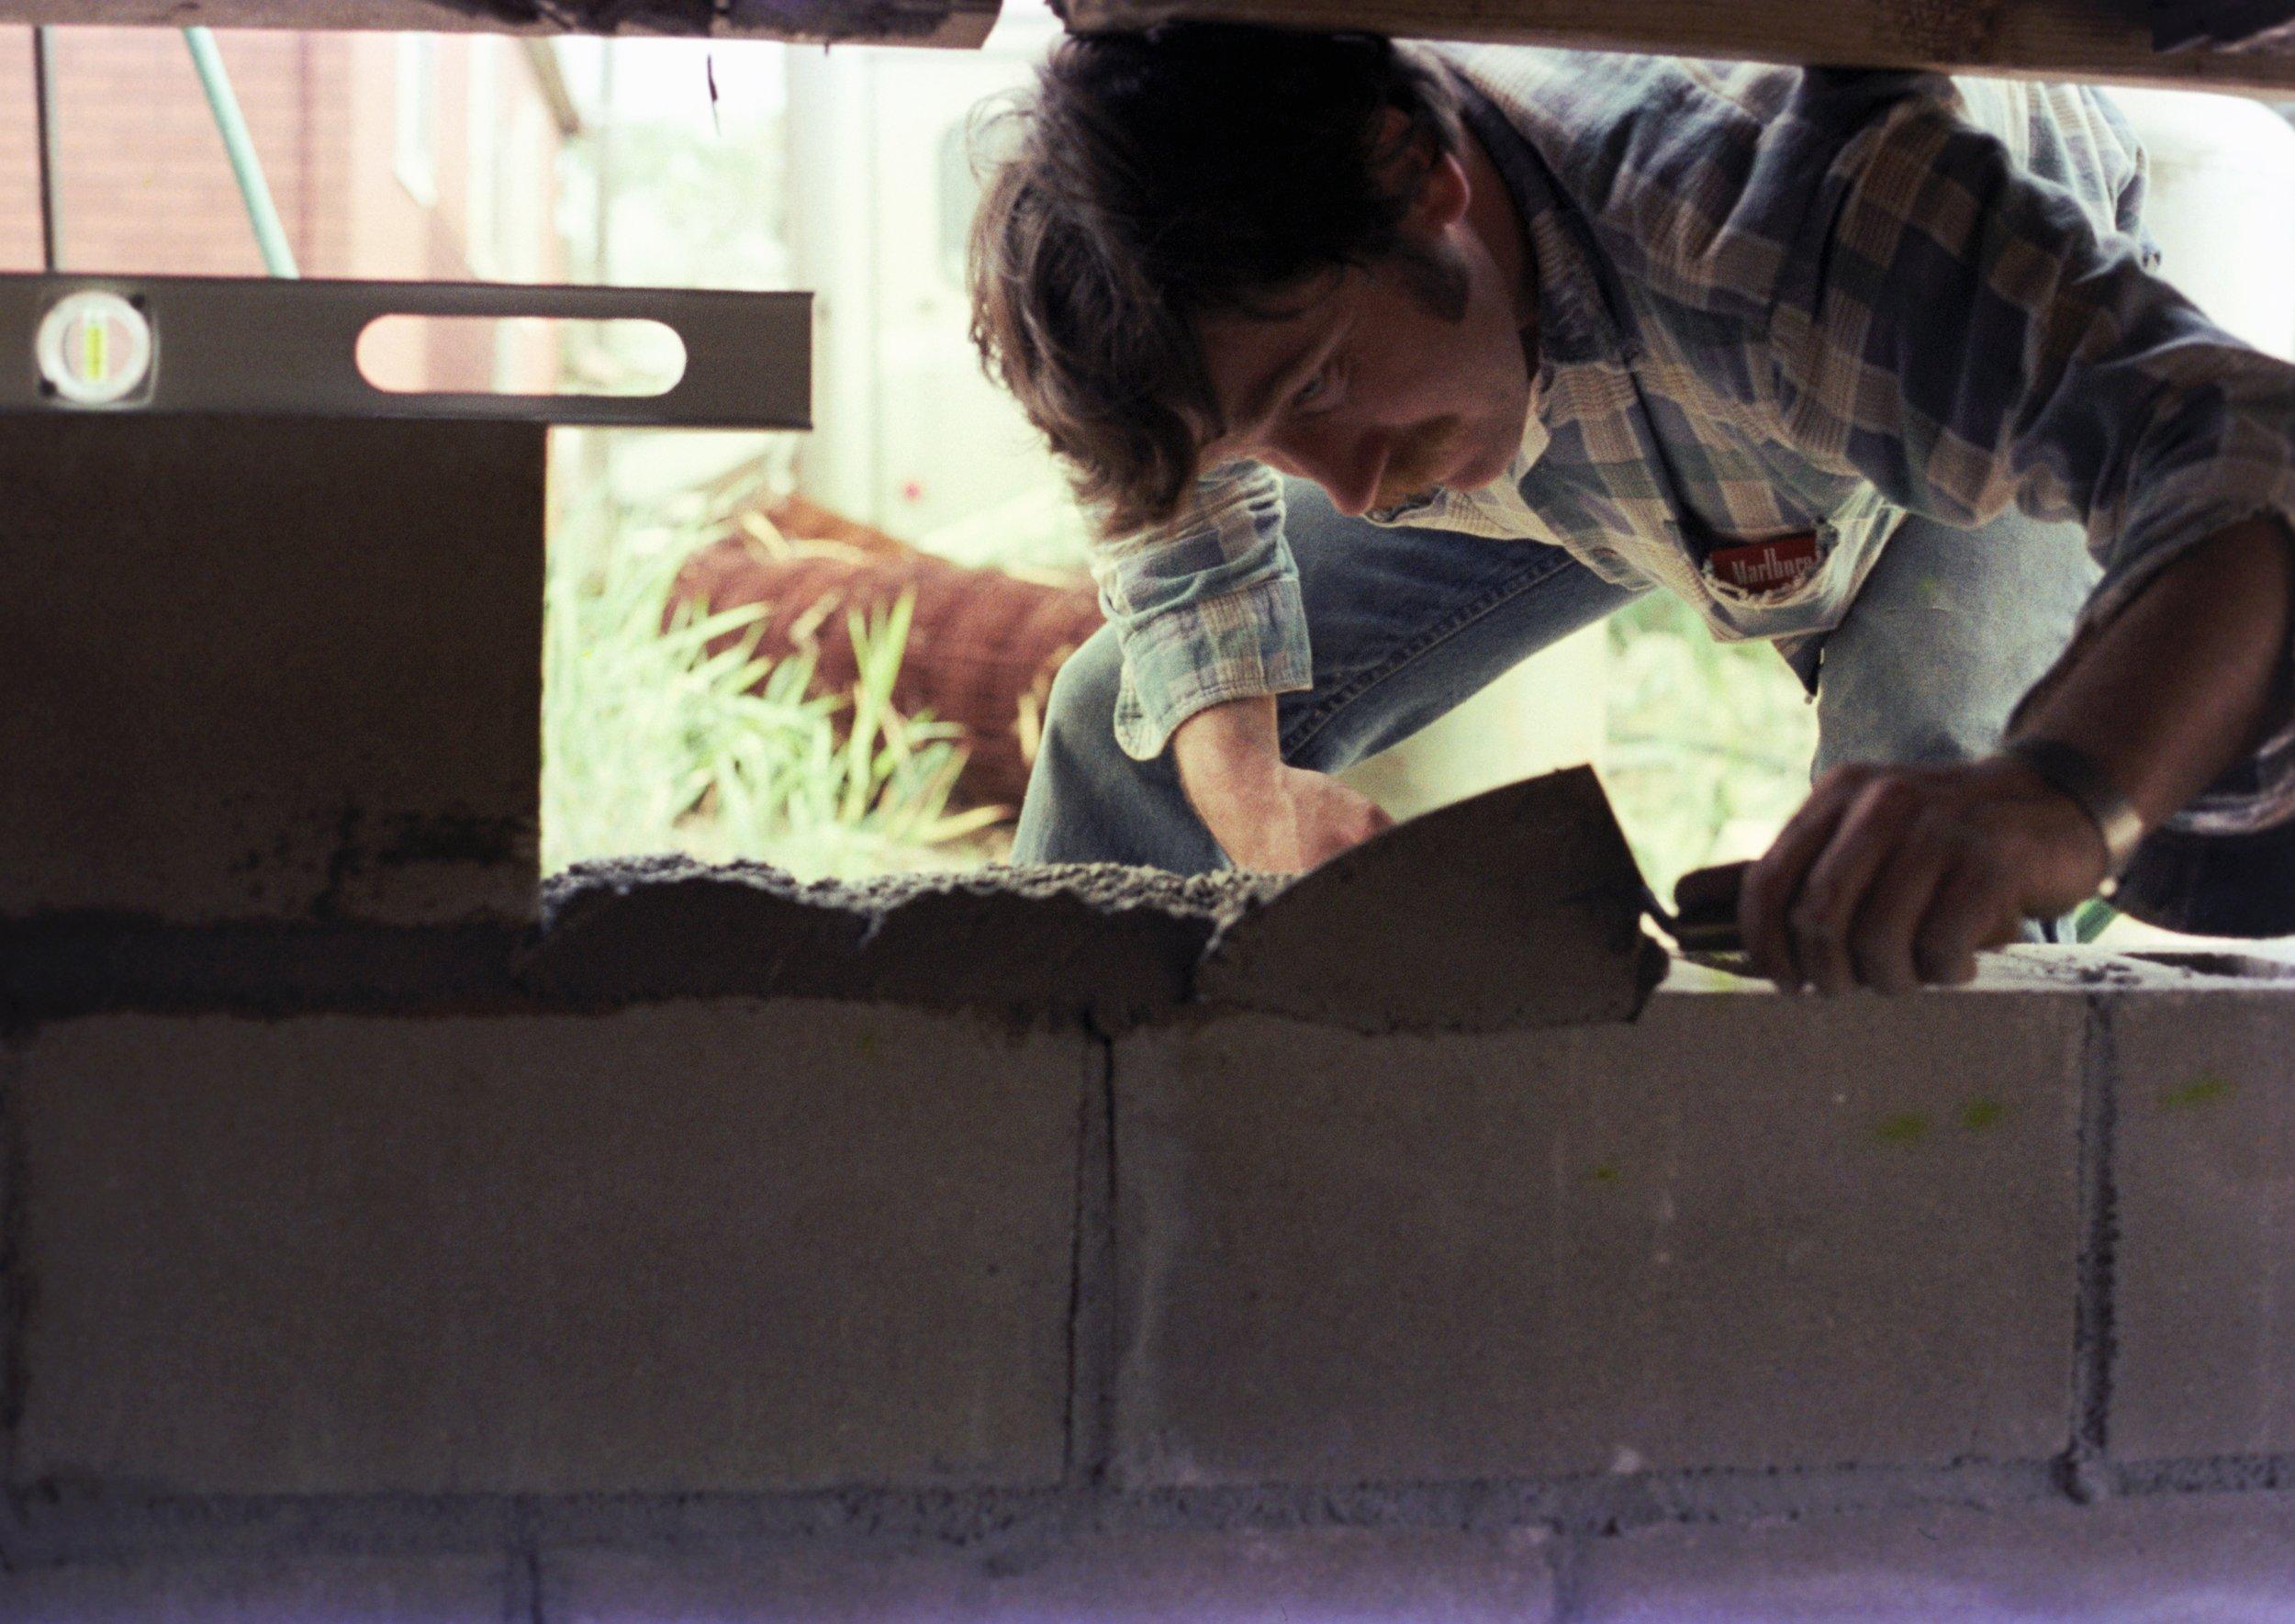 1978_Bird_Sanctuary_Tom_Laying_Cement_Helping_Tractor_Trucks_025.jpg